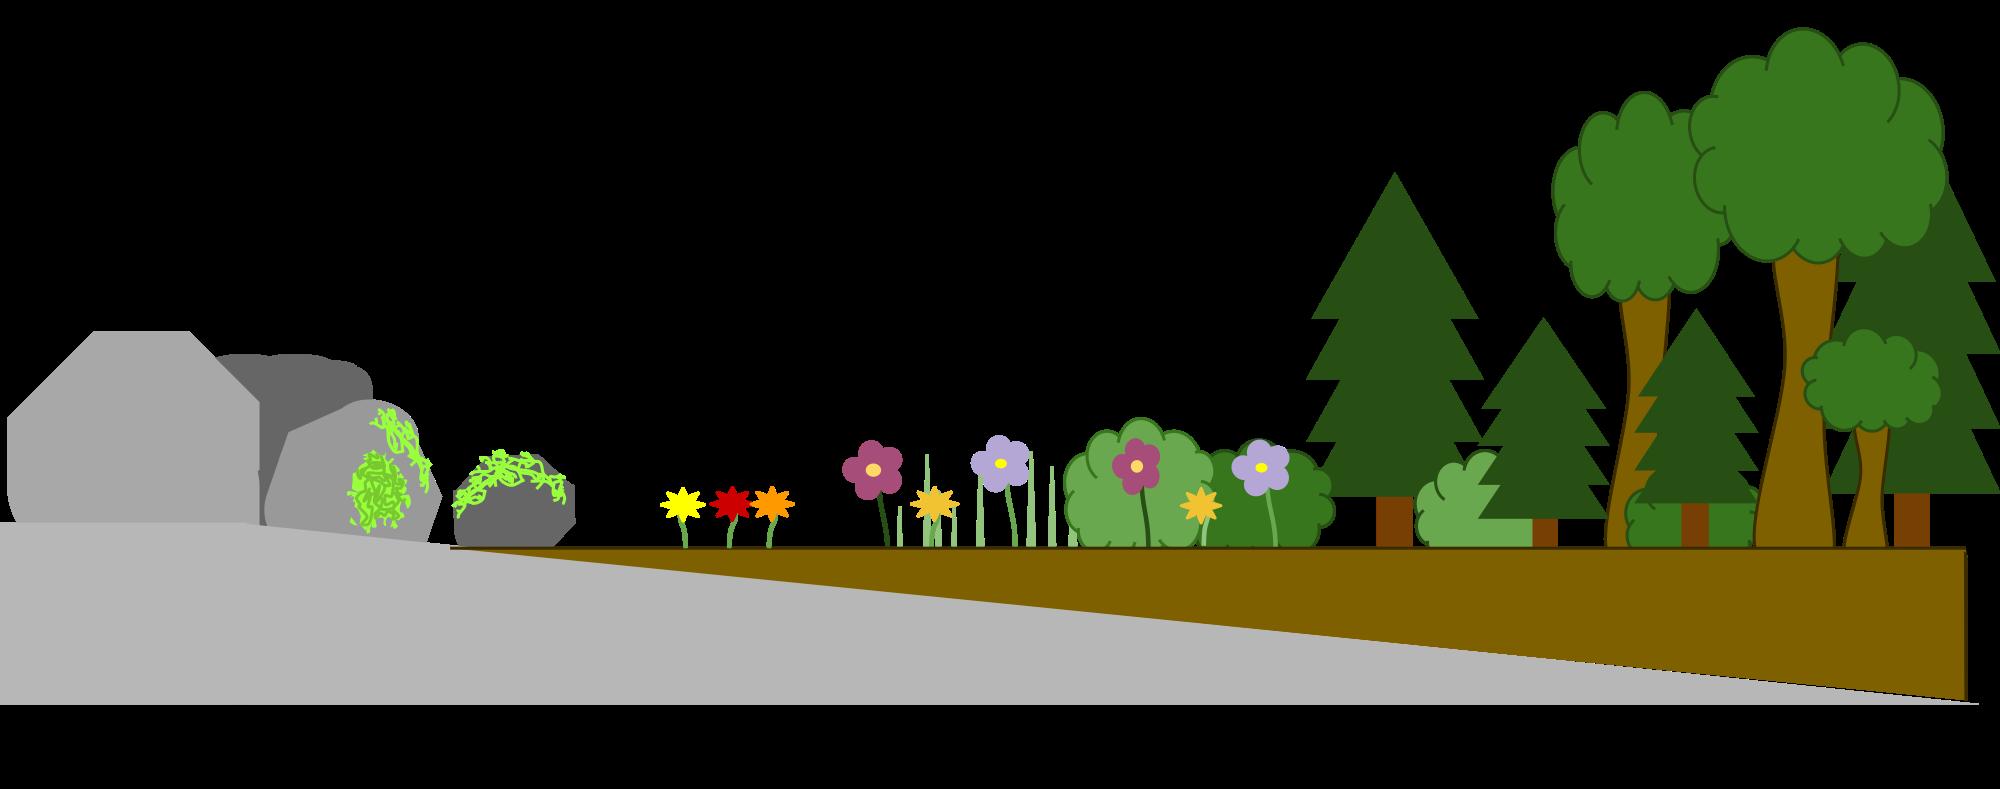 Clipart road timeline. File primary succession diagram